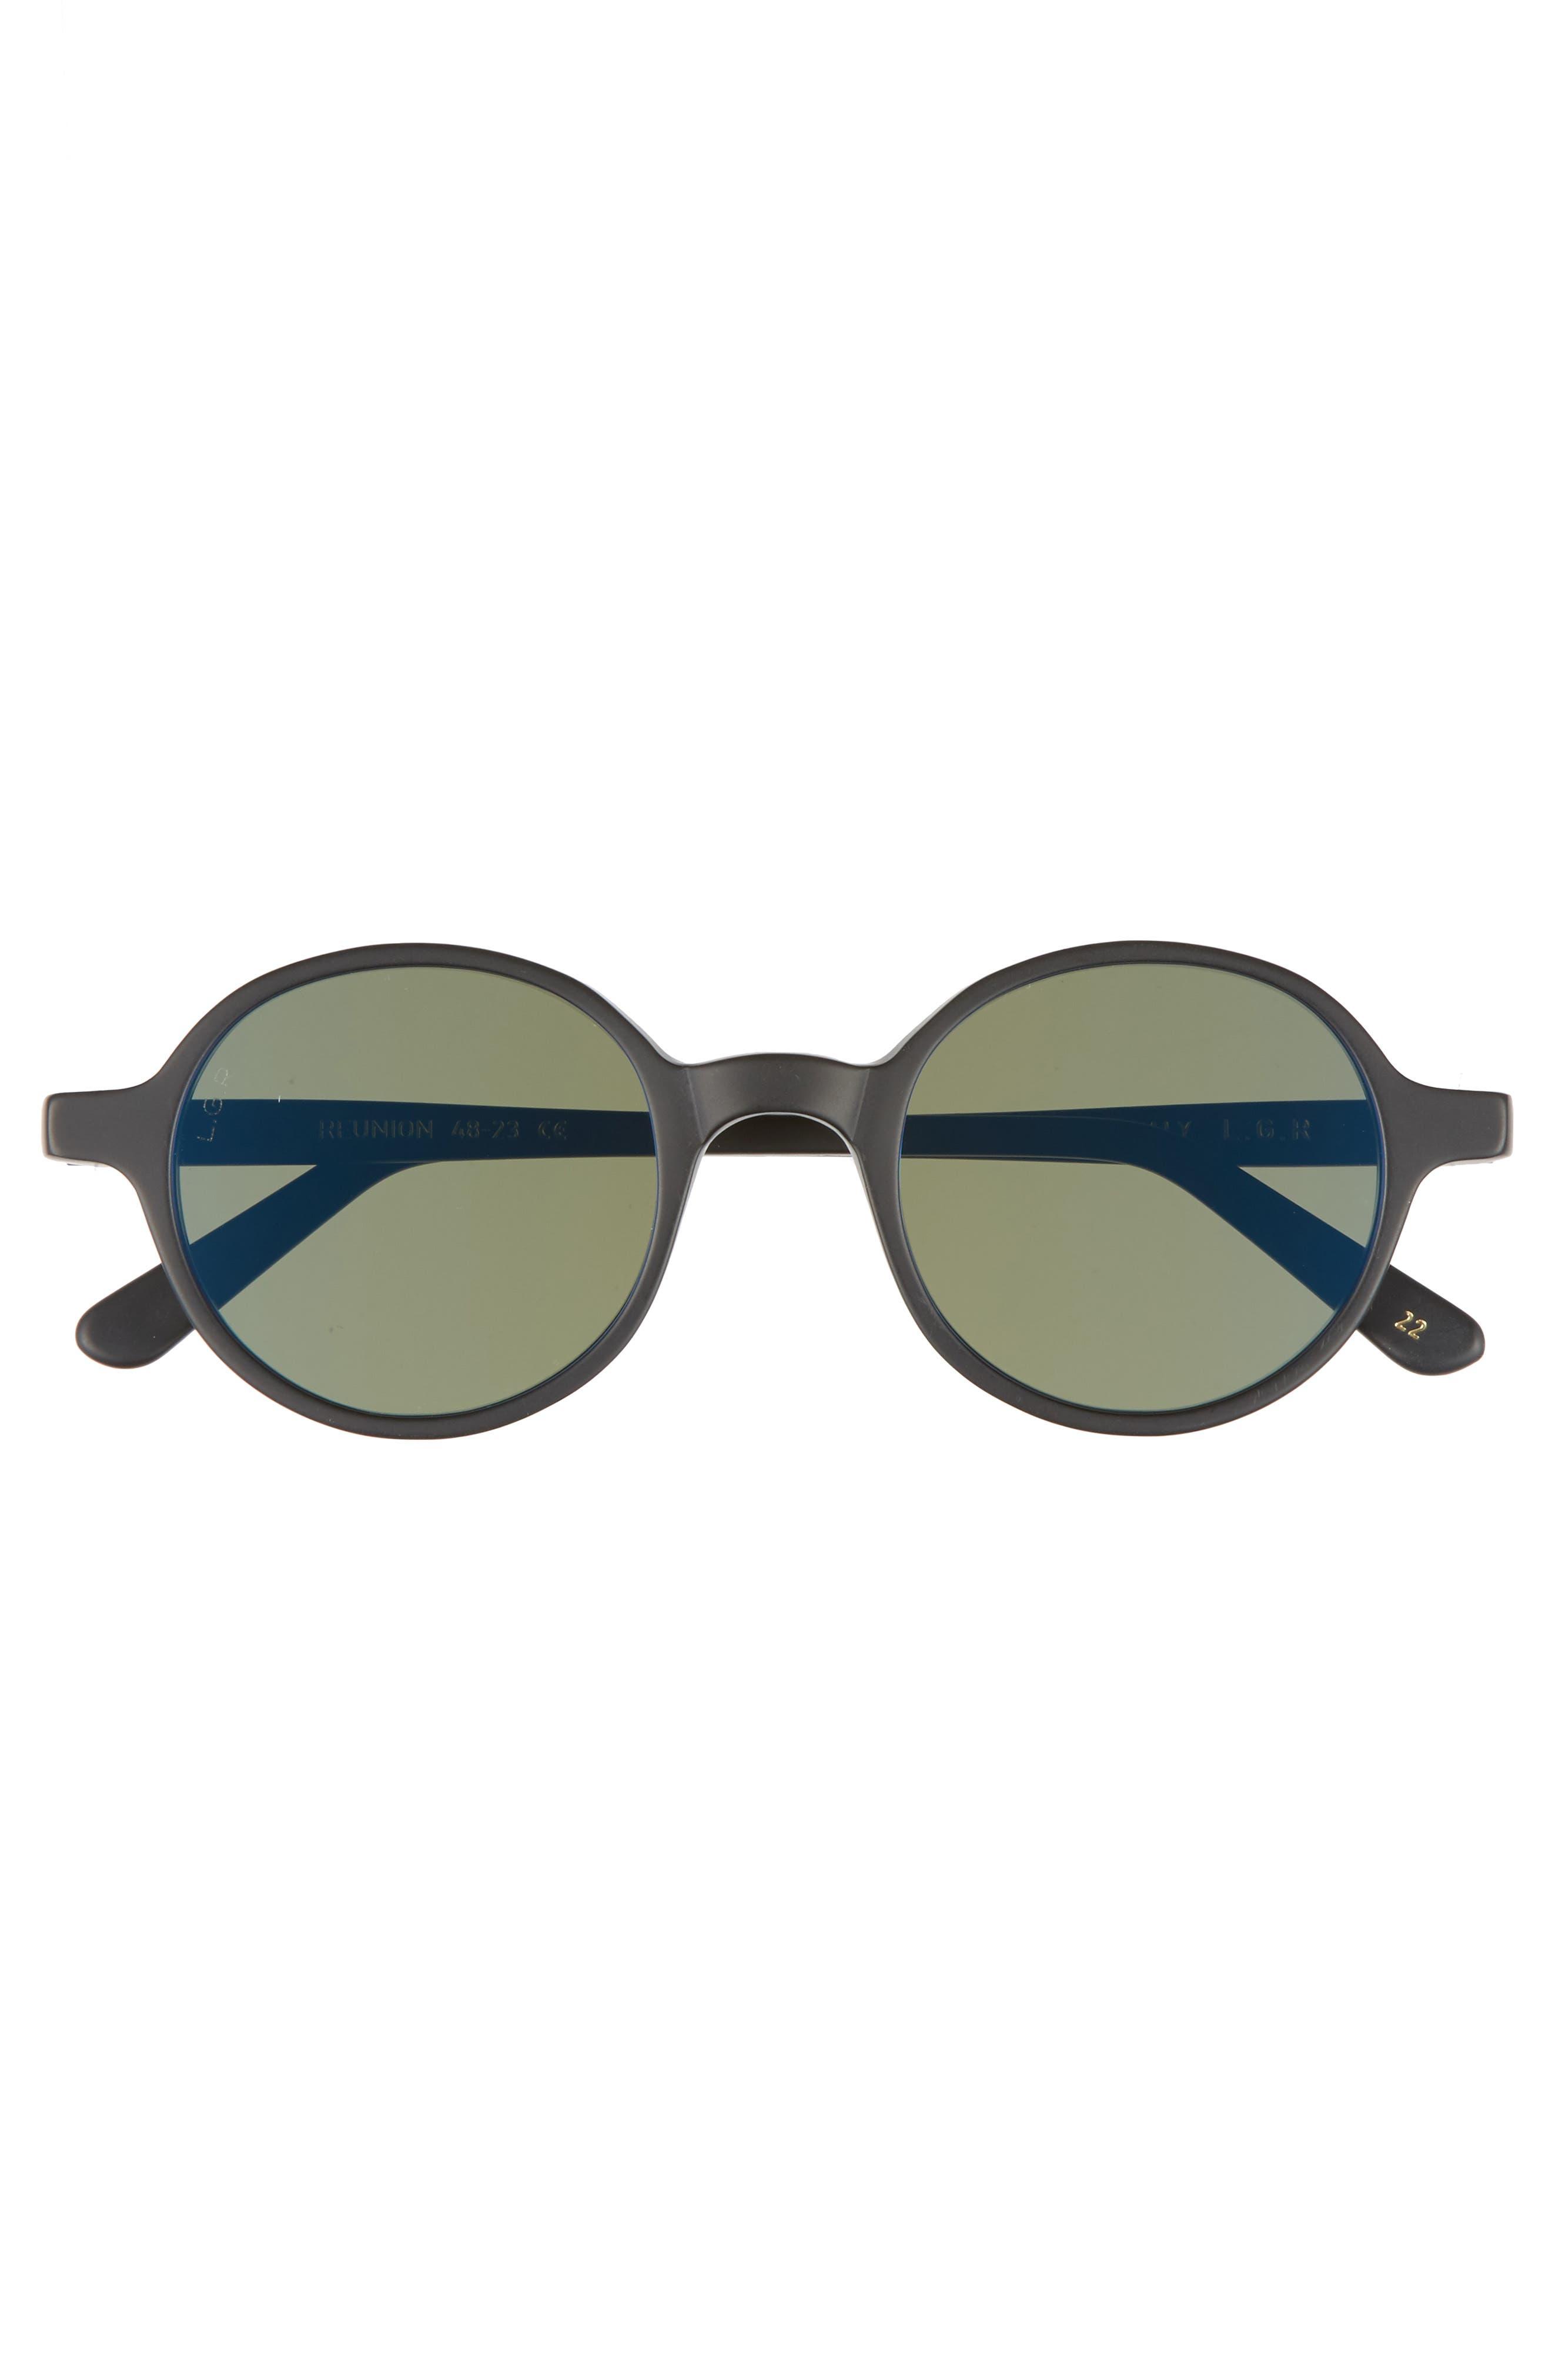 Reunion 48mm Sunglasses,                             Alternate thumbnail 2, color,